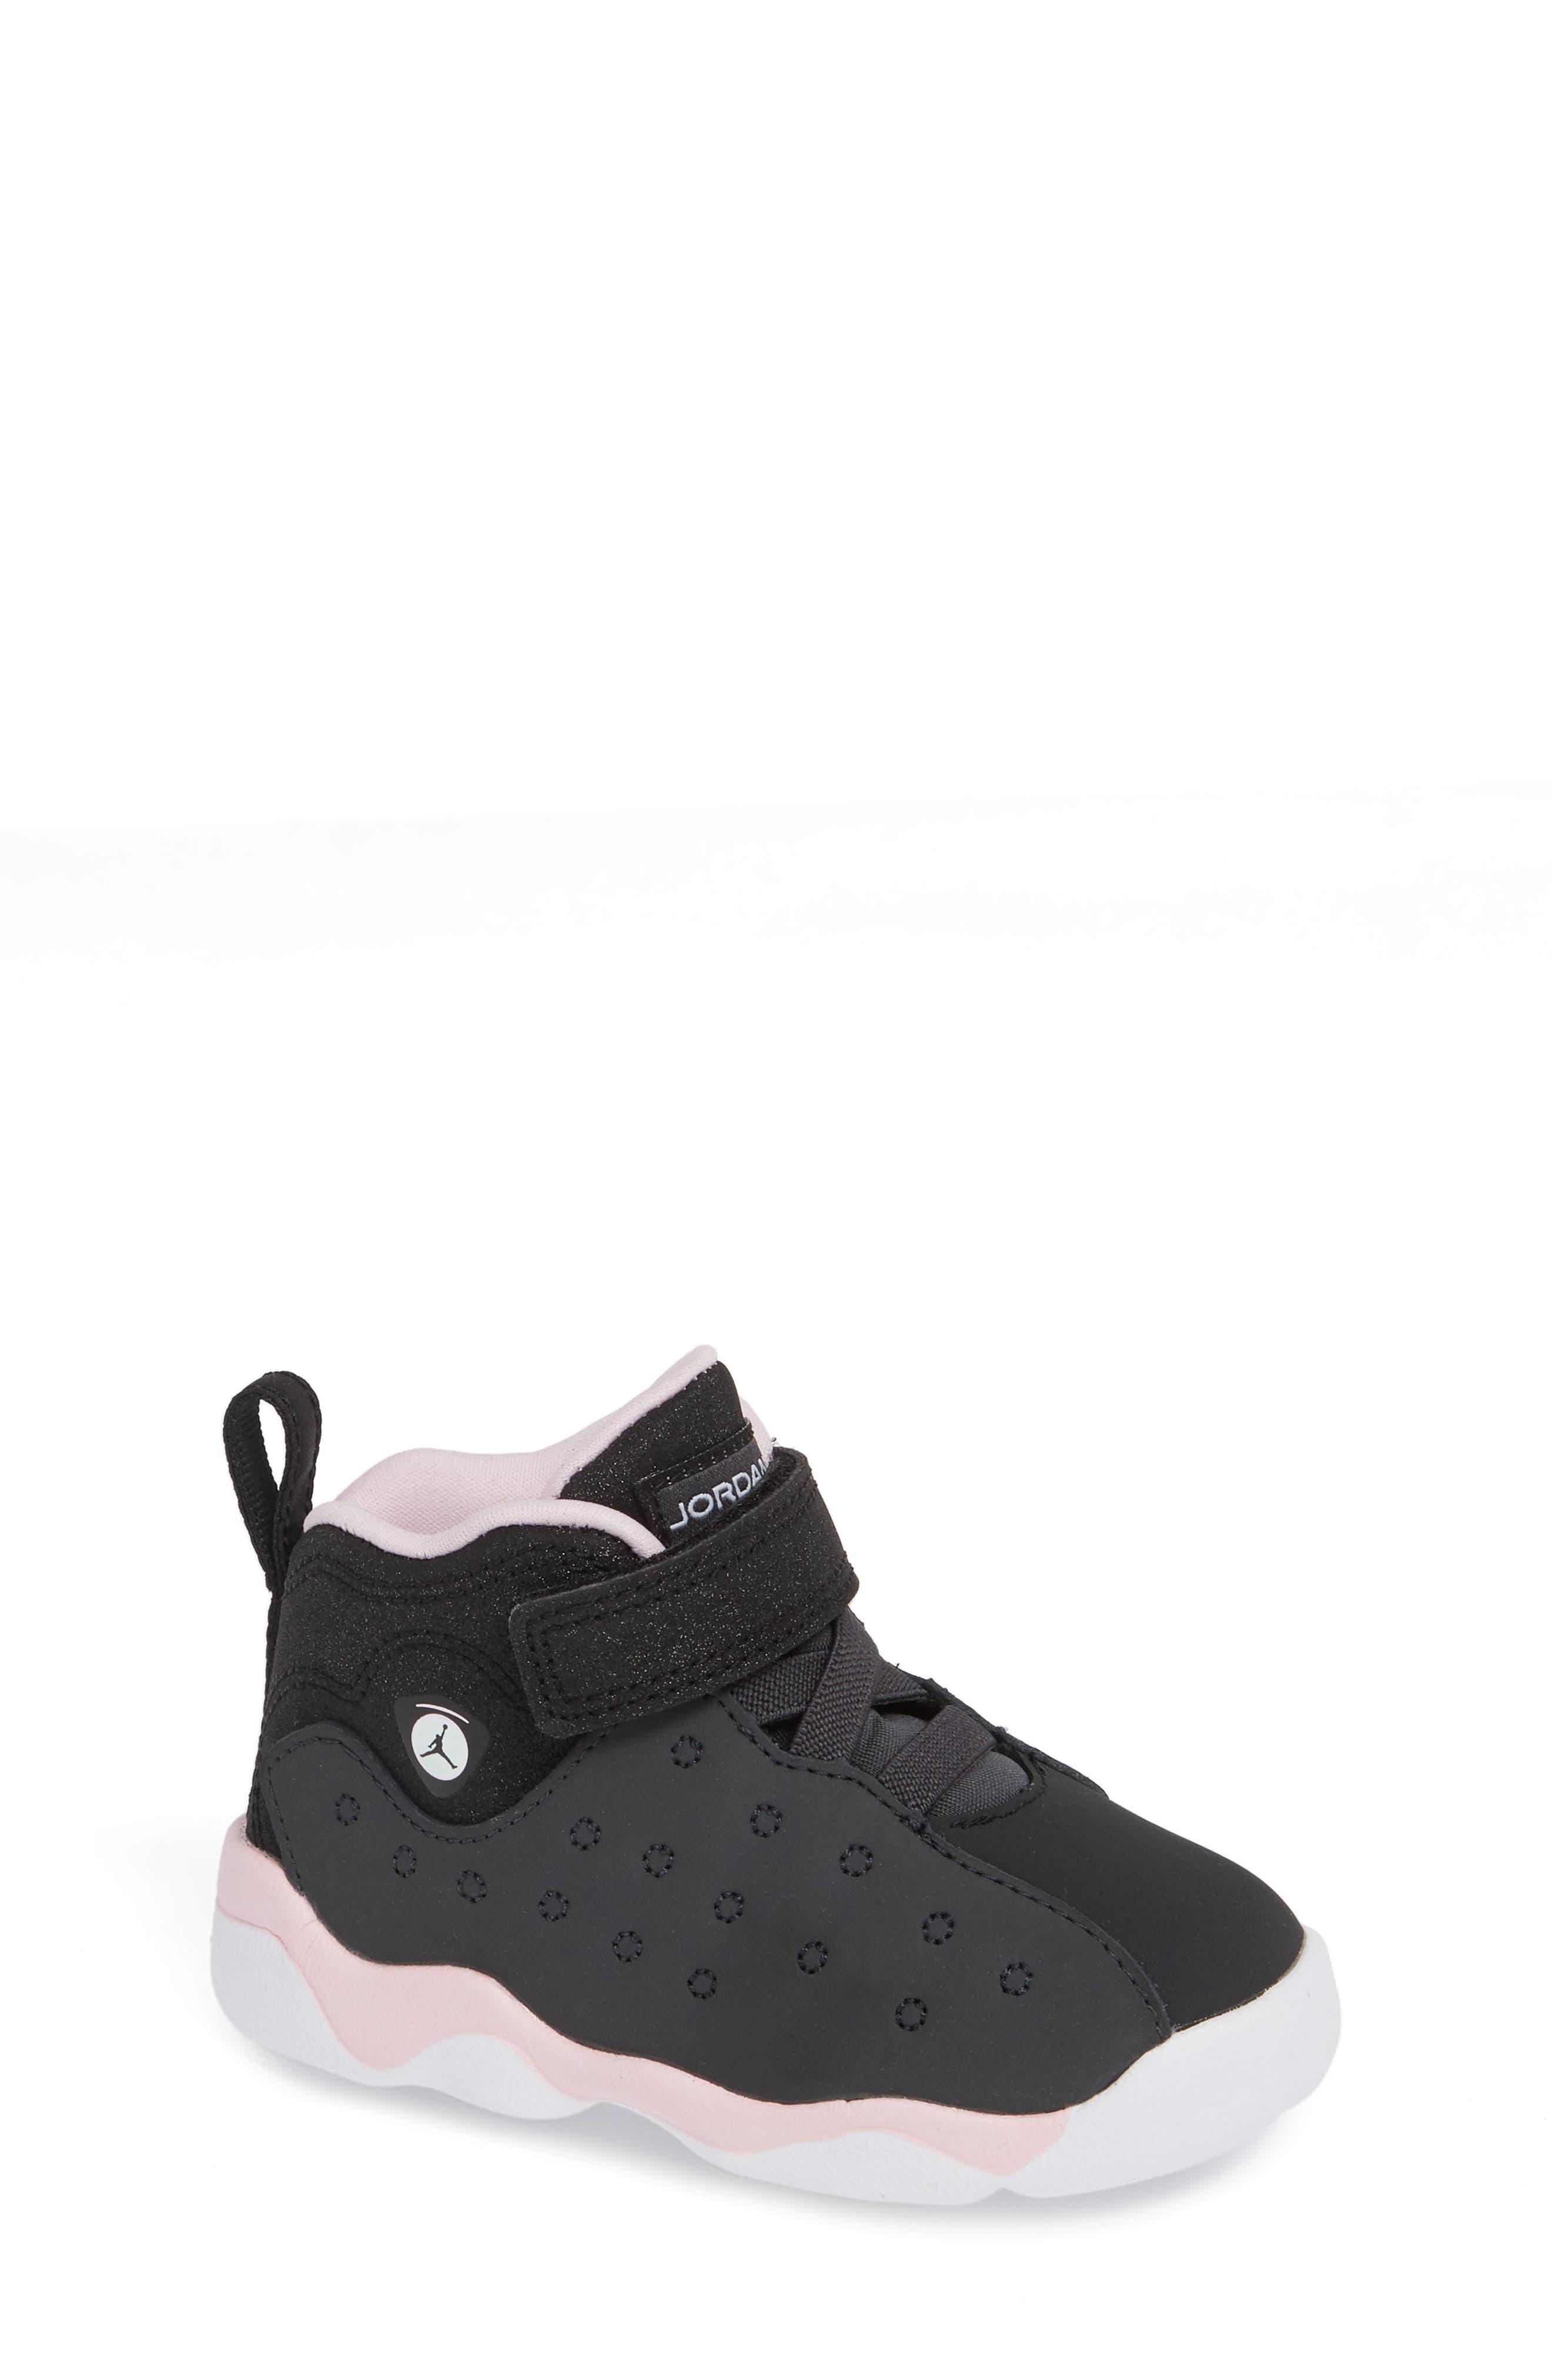 413e702ec Kids  Jordan Shoes